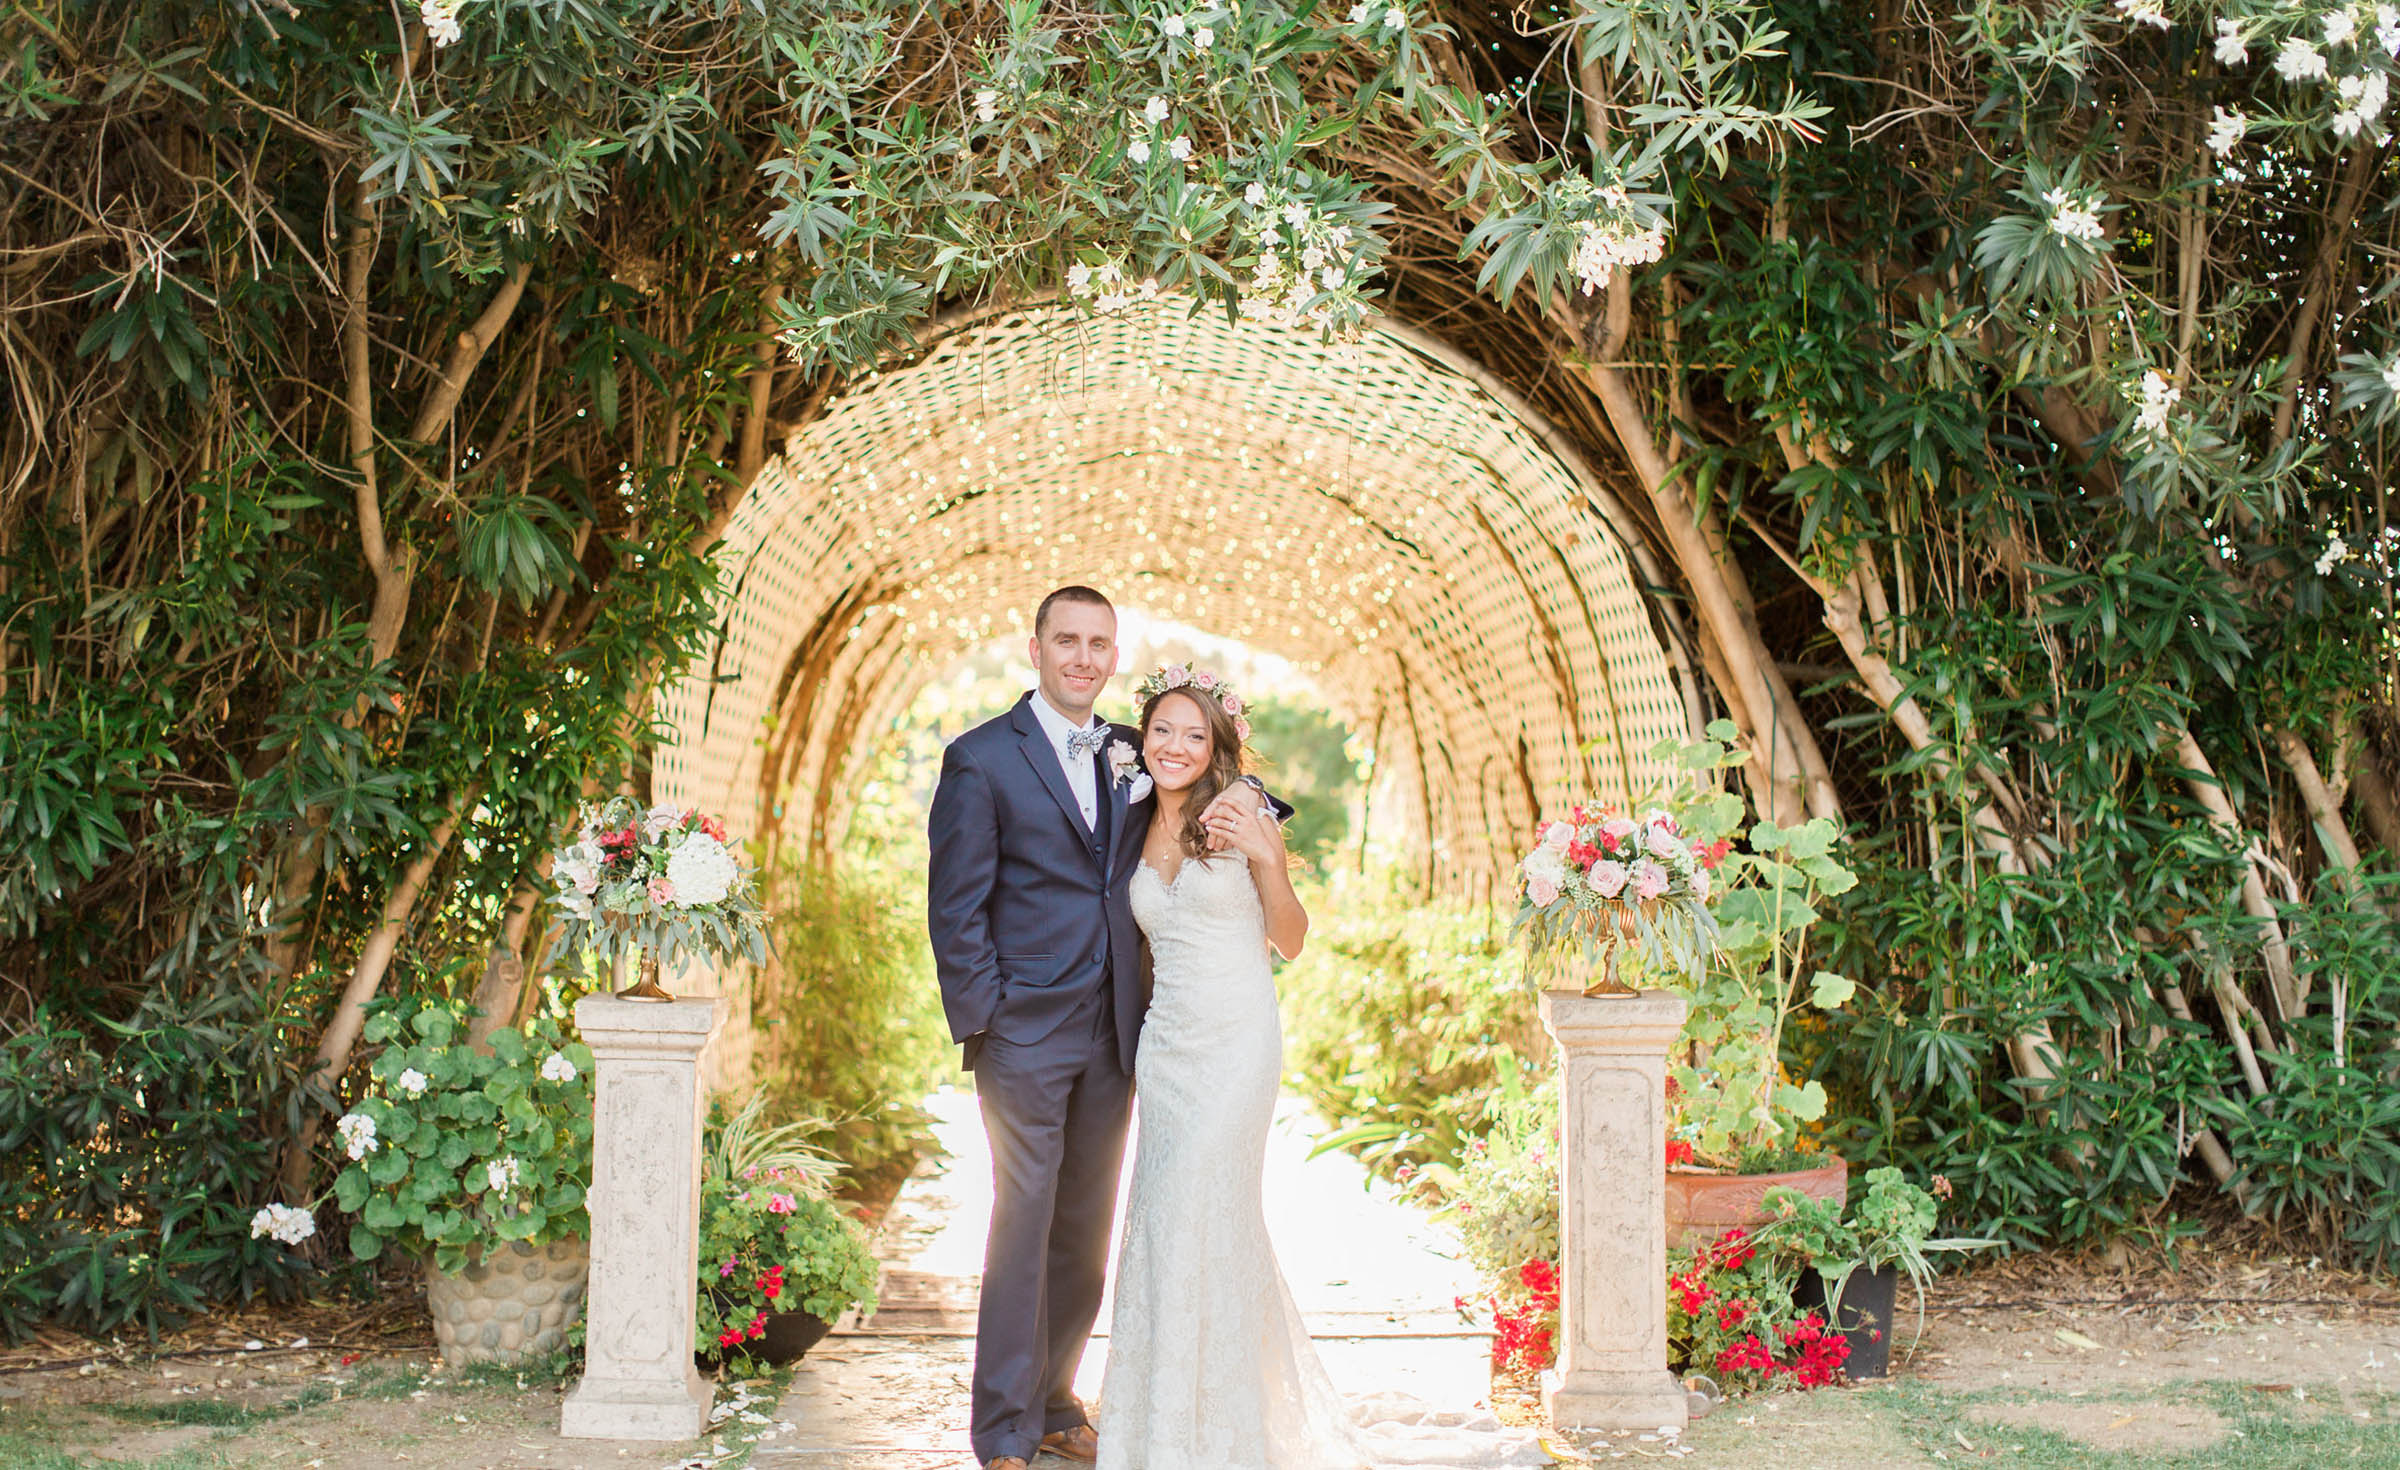 Twinkle lights tunnel  - Orchard - Menifee, California - Riverside County - Wedgewood Weddings